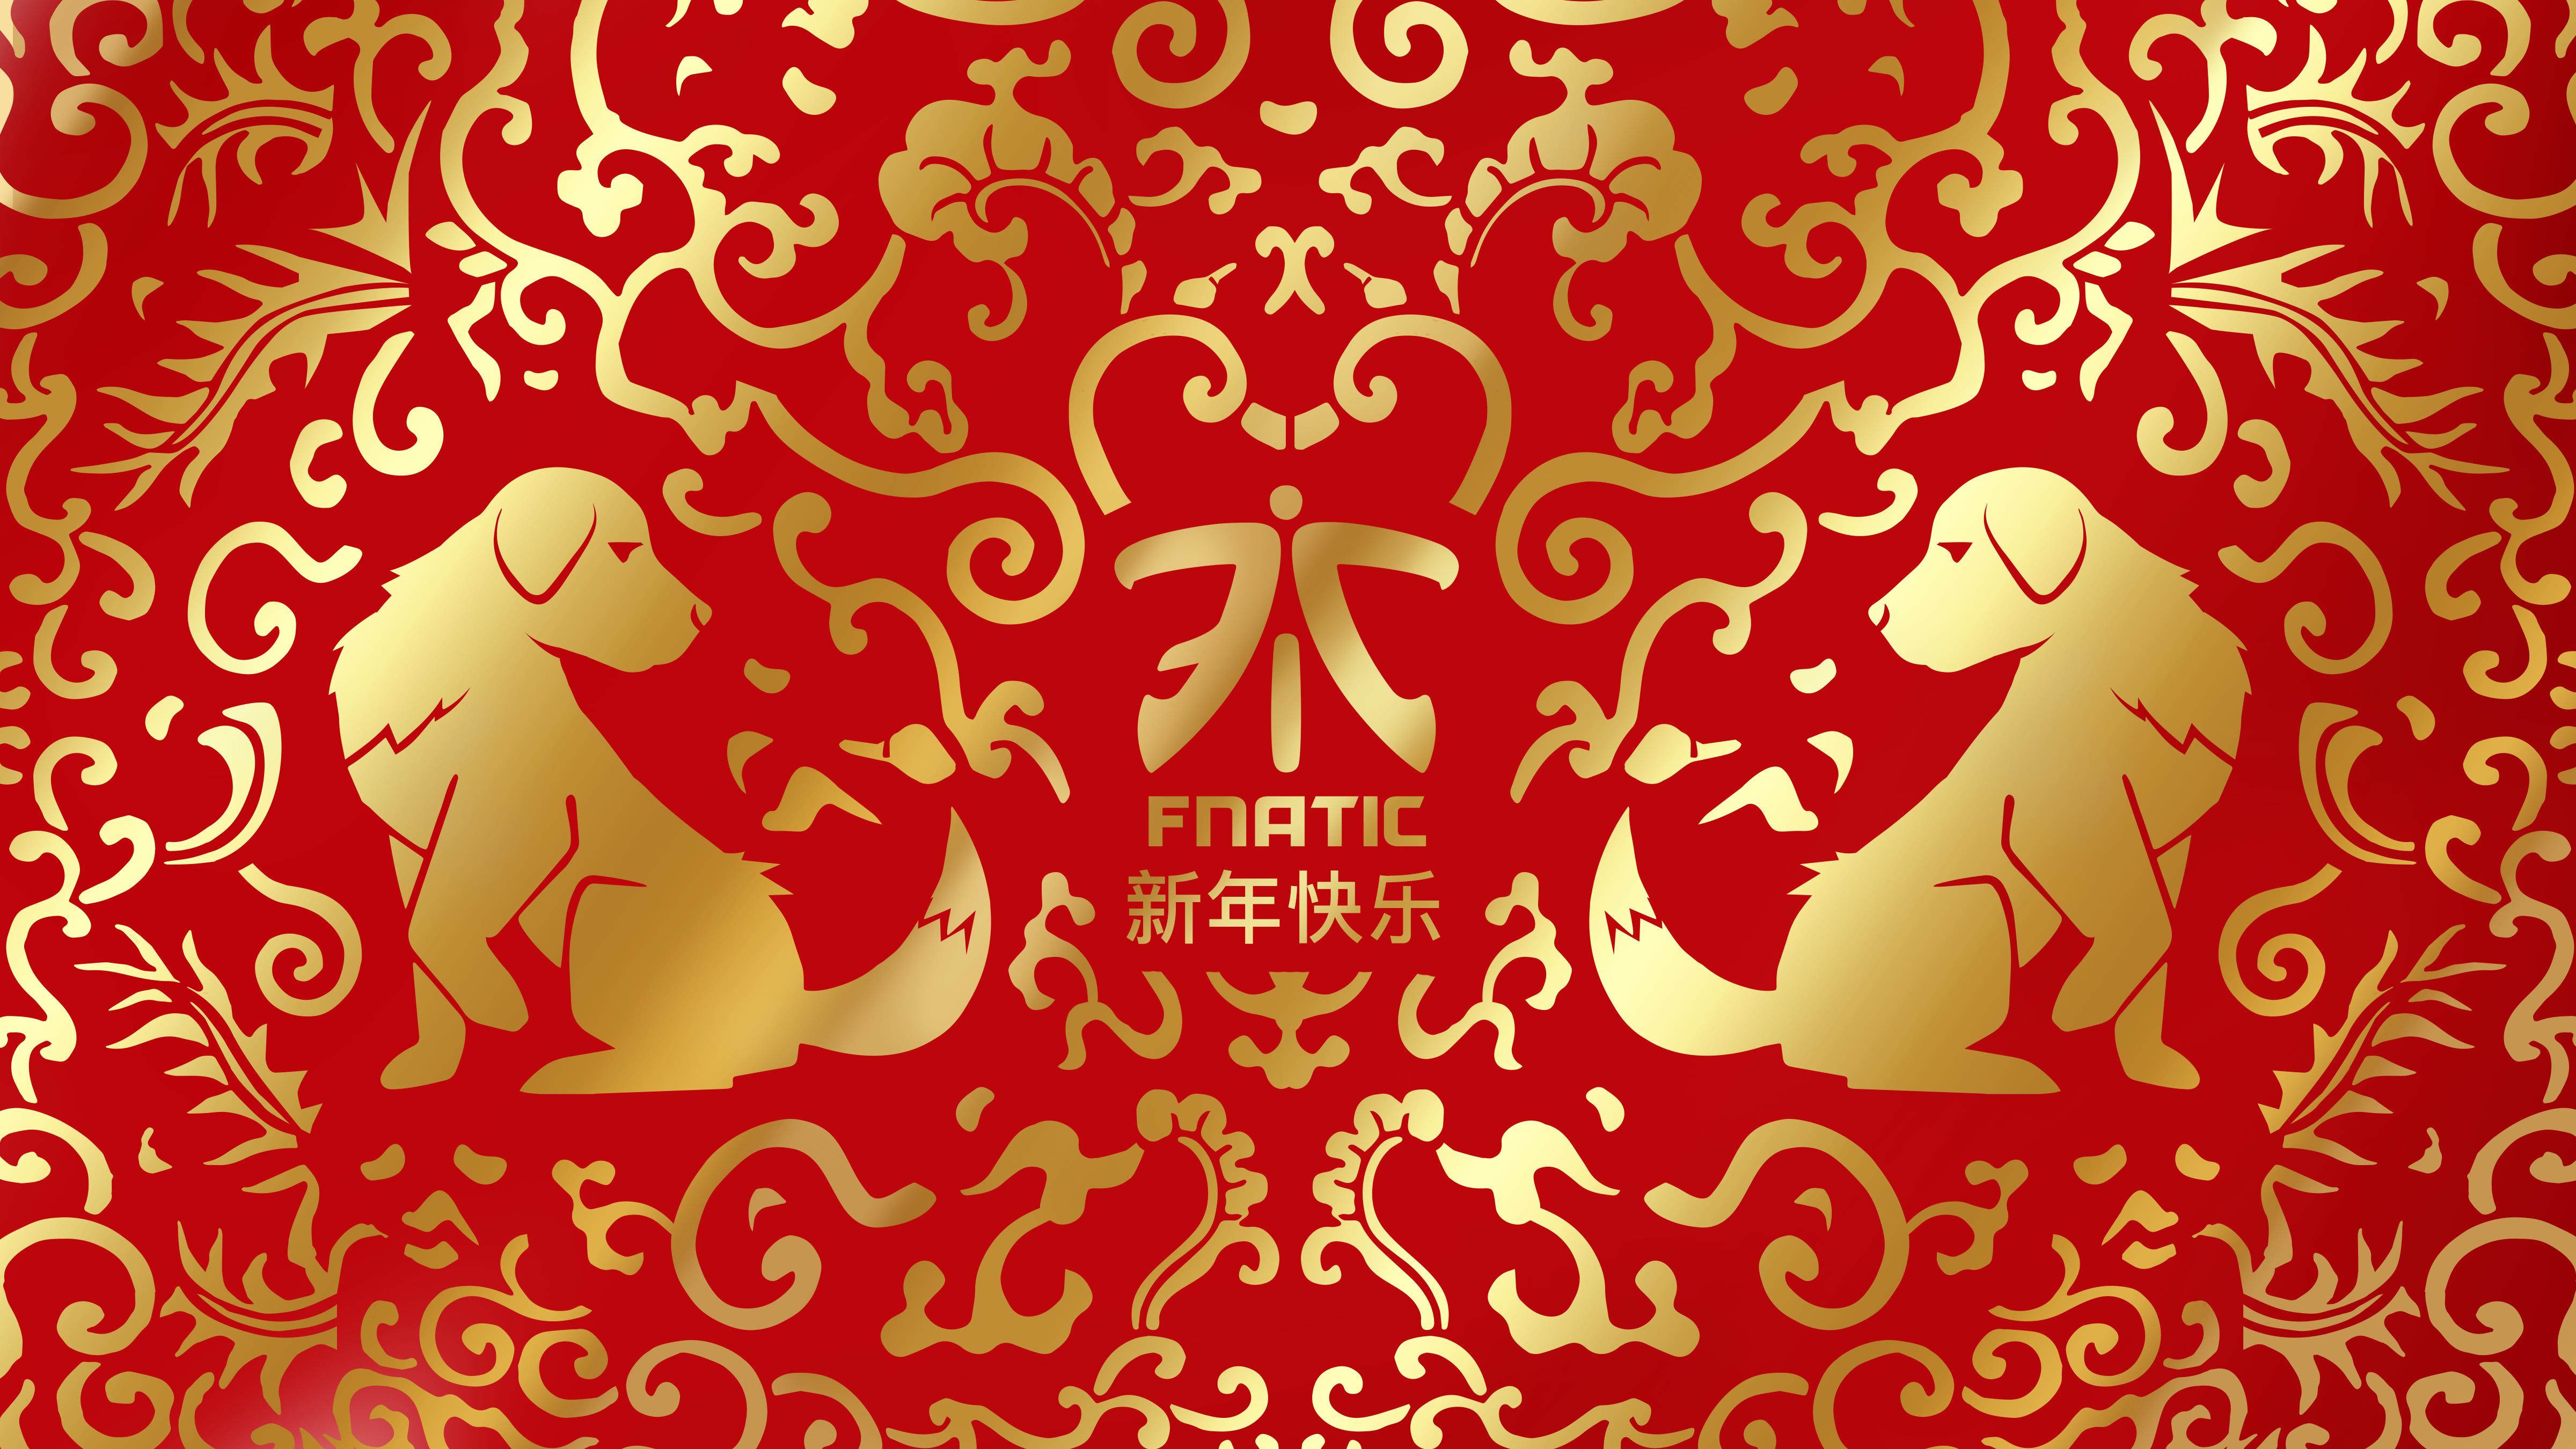 Chinese New Year Wallpaper 2018   4800x2700 Wallpaper   Ecopetitcat 4800x2700